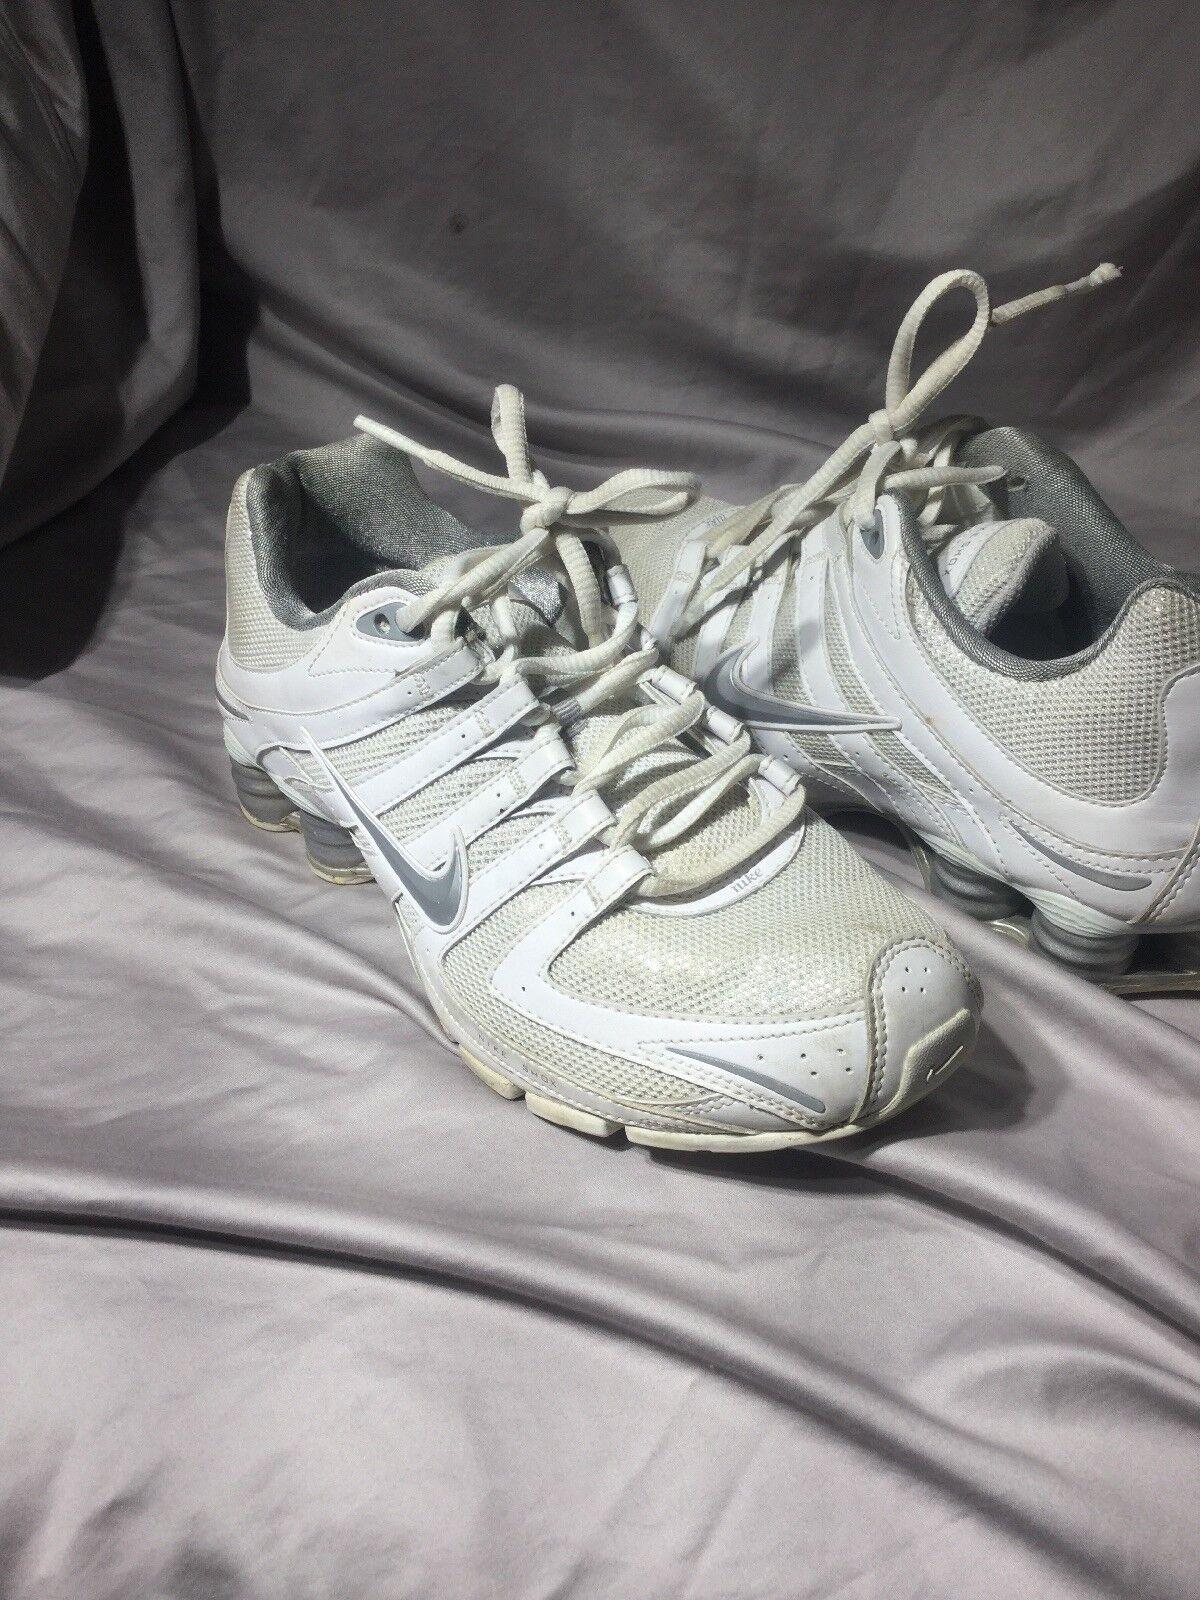 Nike glitter shox 8 noi 392868 105 bianco argentoo 2010